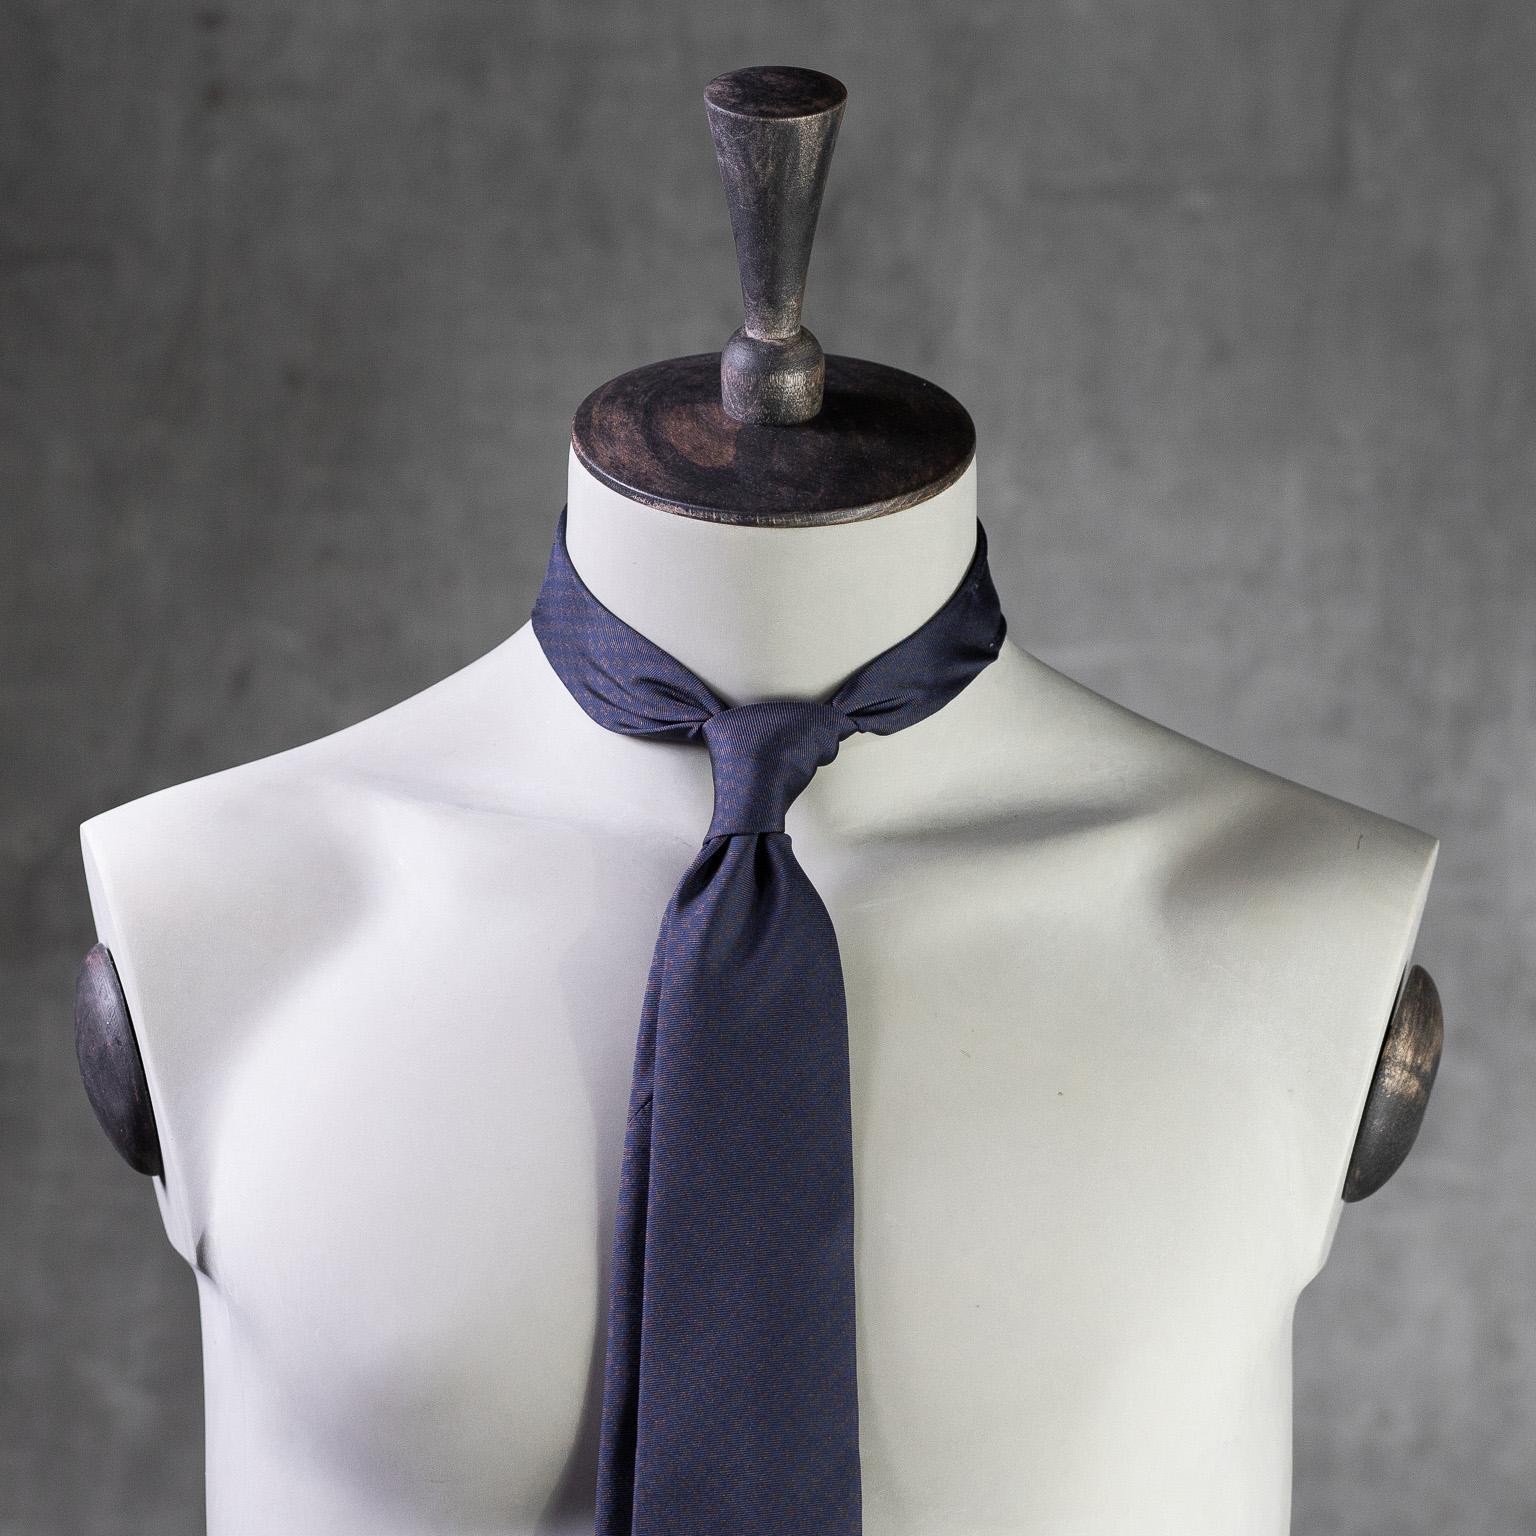 PRINTED-SILK-SEDA-ESTAMPADA-0582-Tie-Initials-Corbata-Iniciales-The-Seelk-2